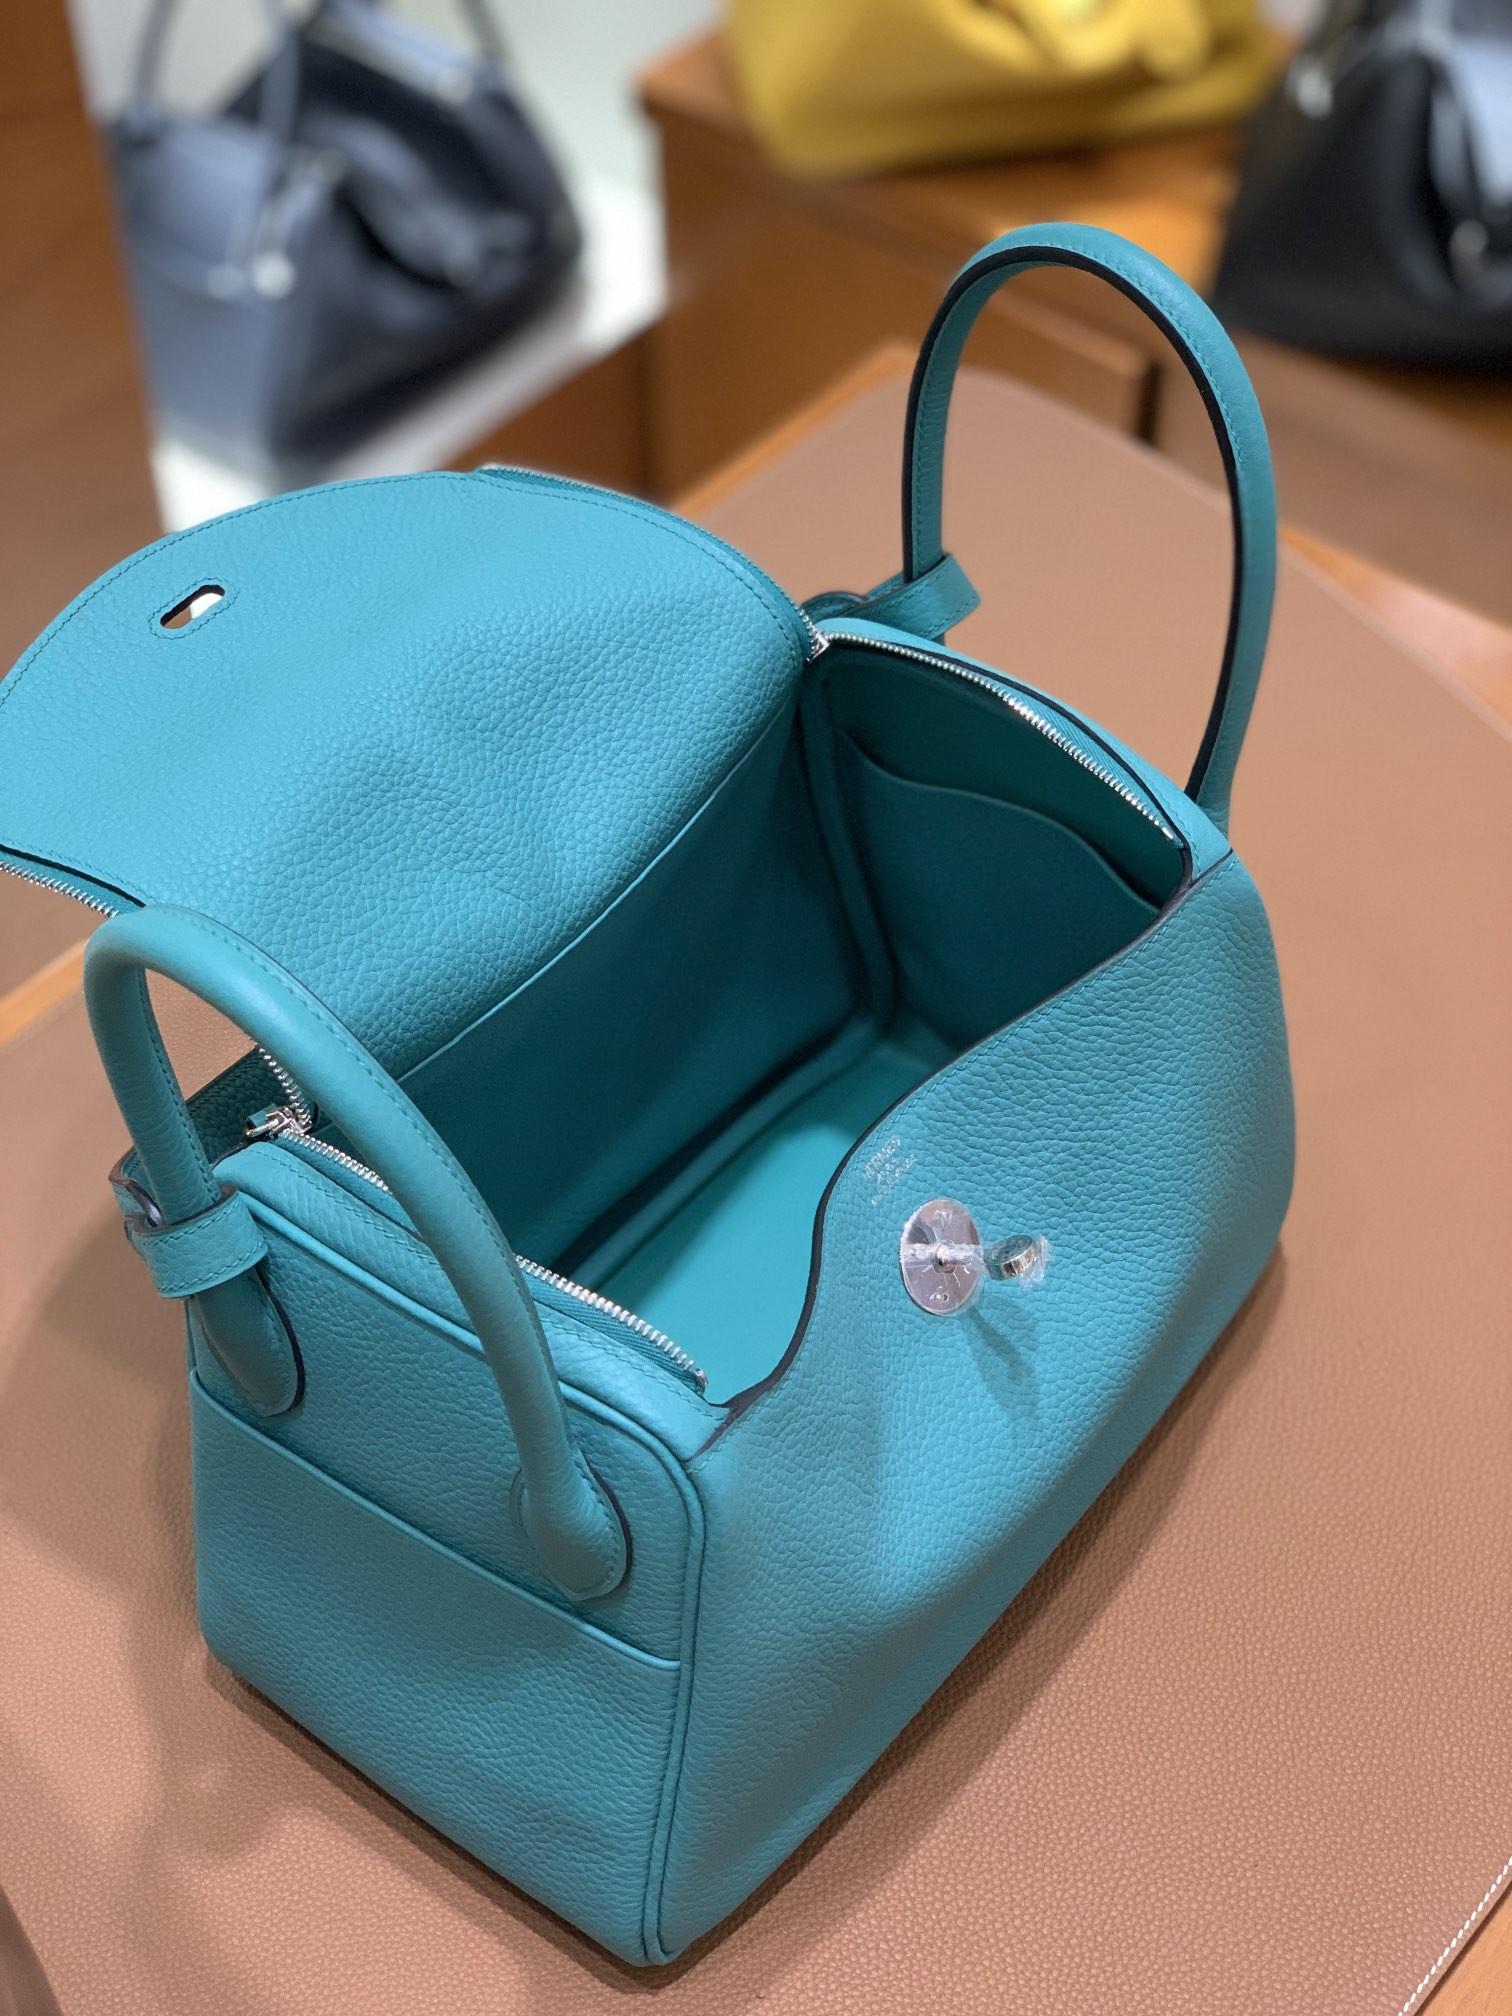 Hermès(爱马仕)Lindy 琳迪包 TC 维罗纳绿 银扣 26cm 现货